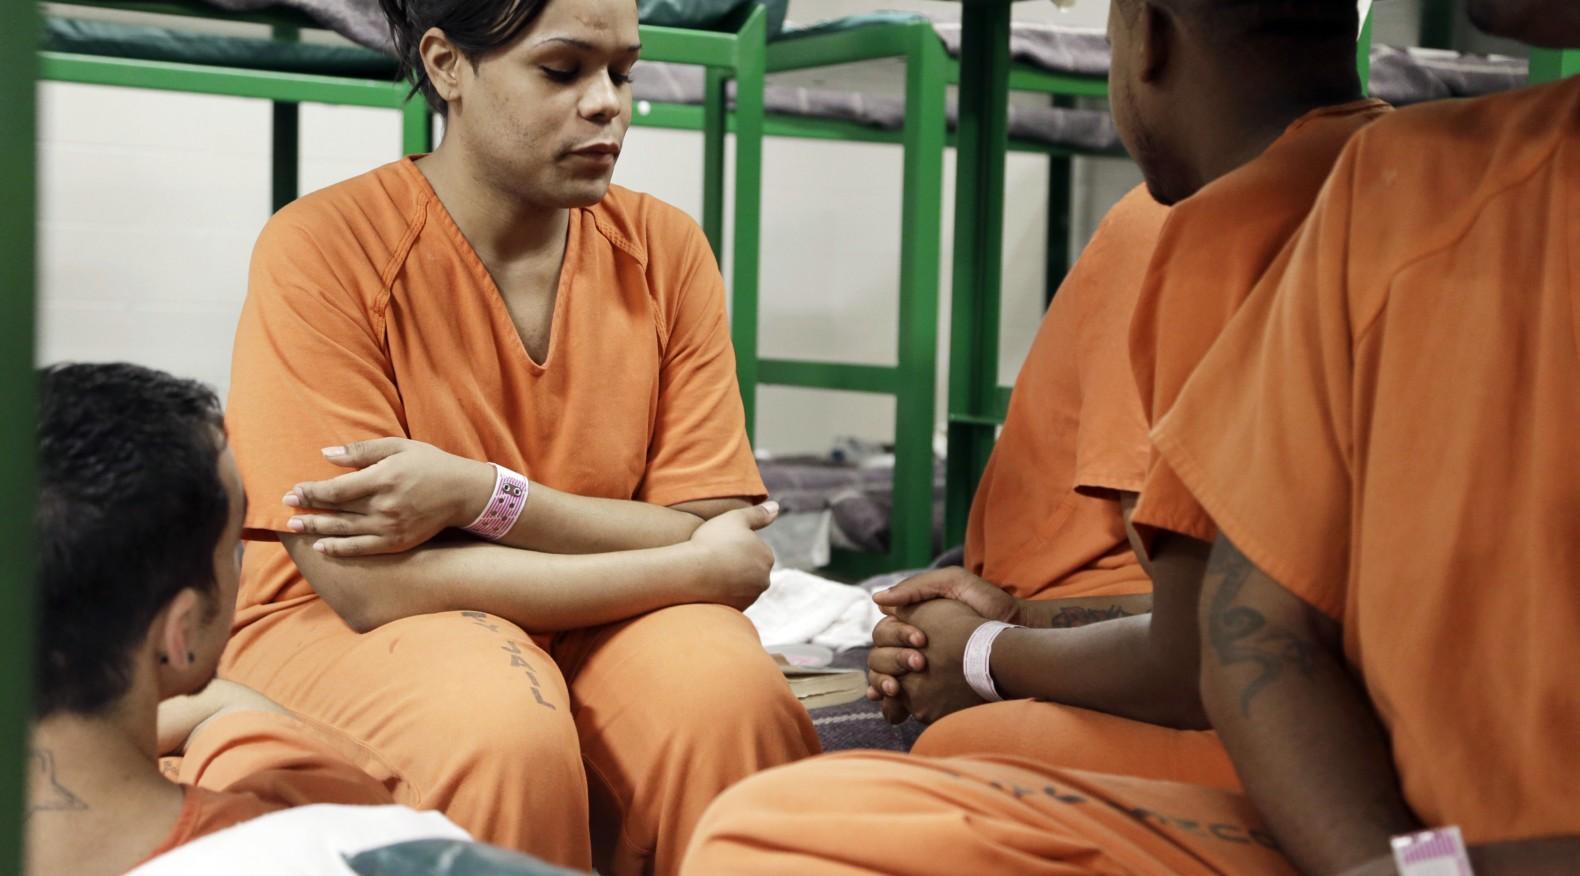 treatment of transgender prisoners essay